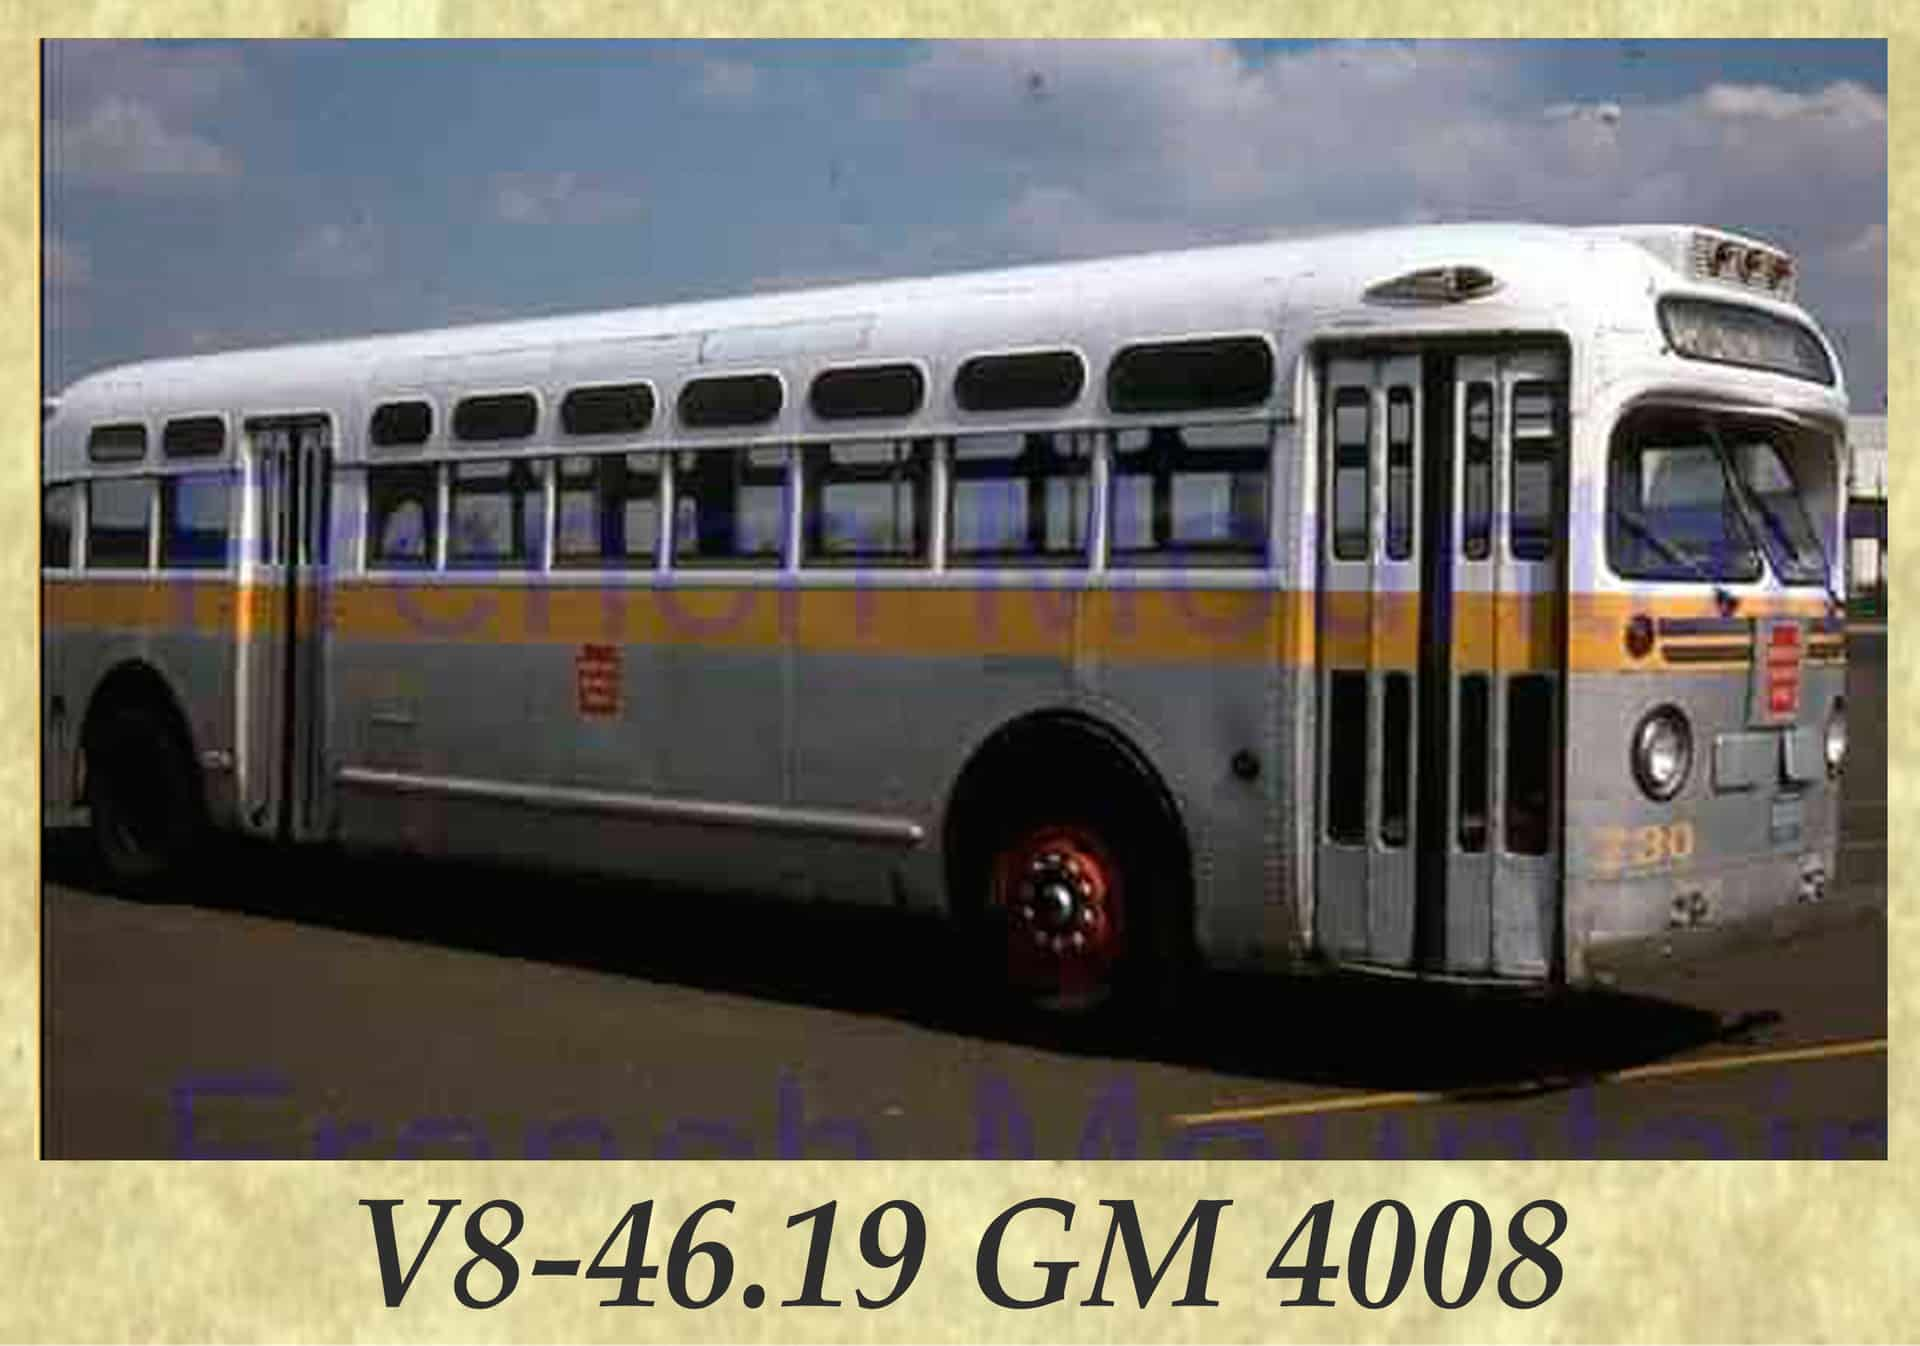 V8-46.19 GM 4008